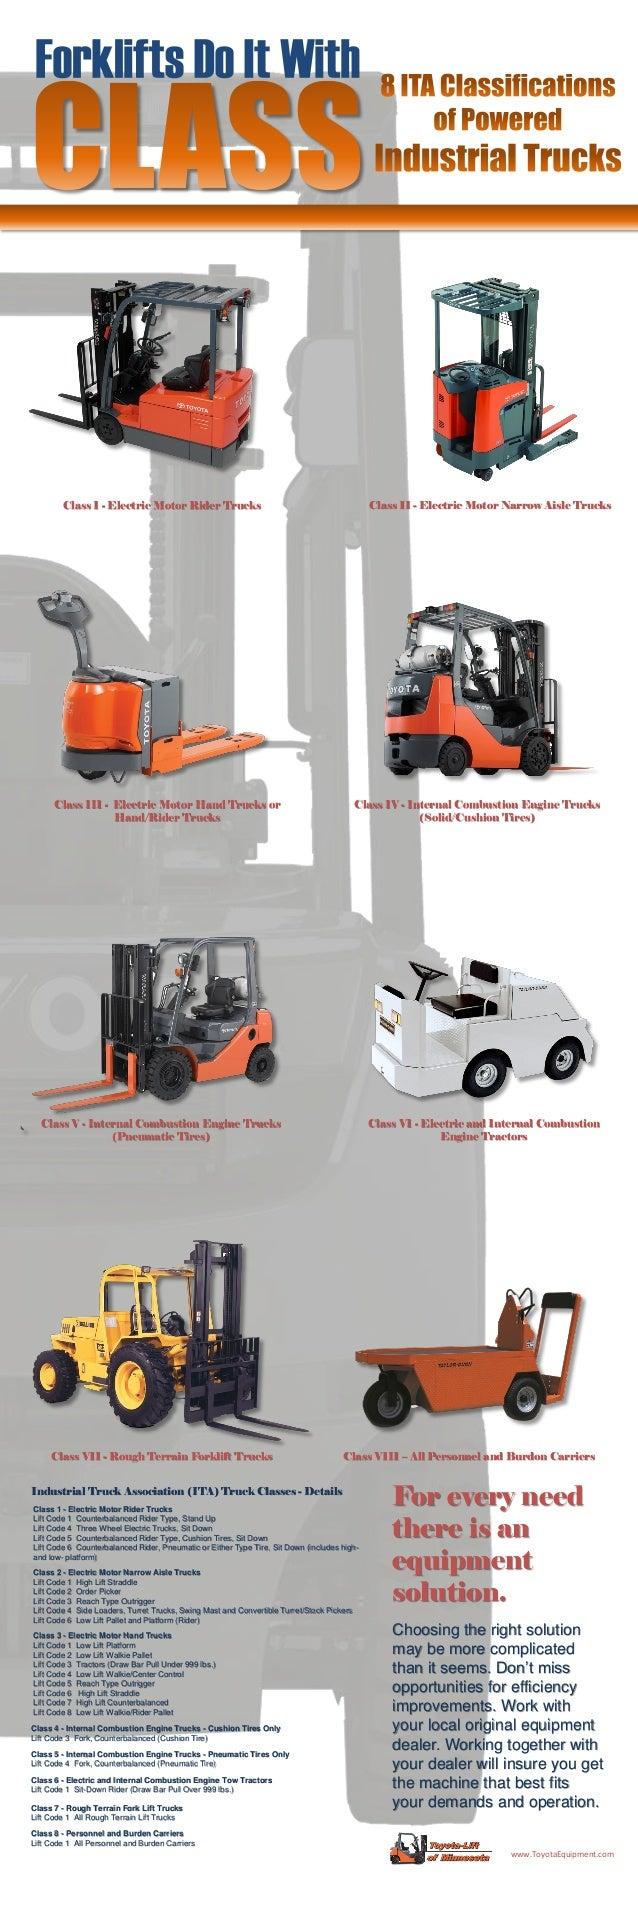 Forklift Ita Equipment Classifications